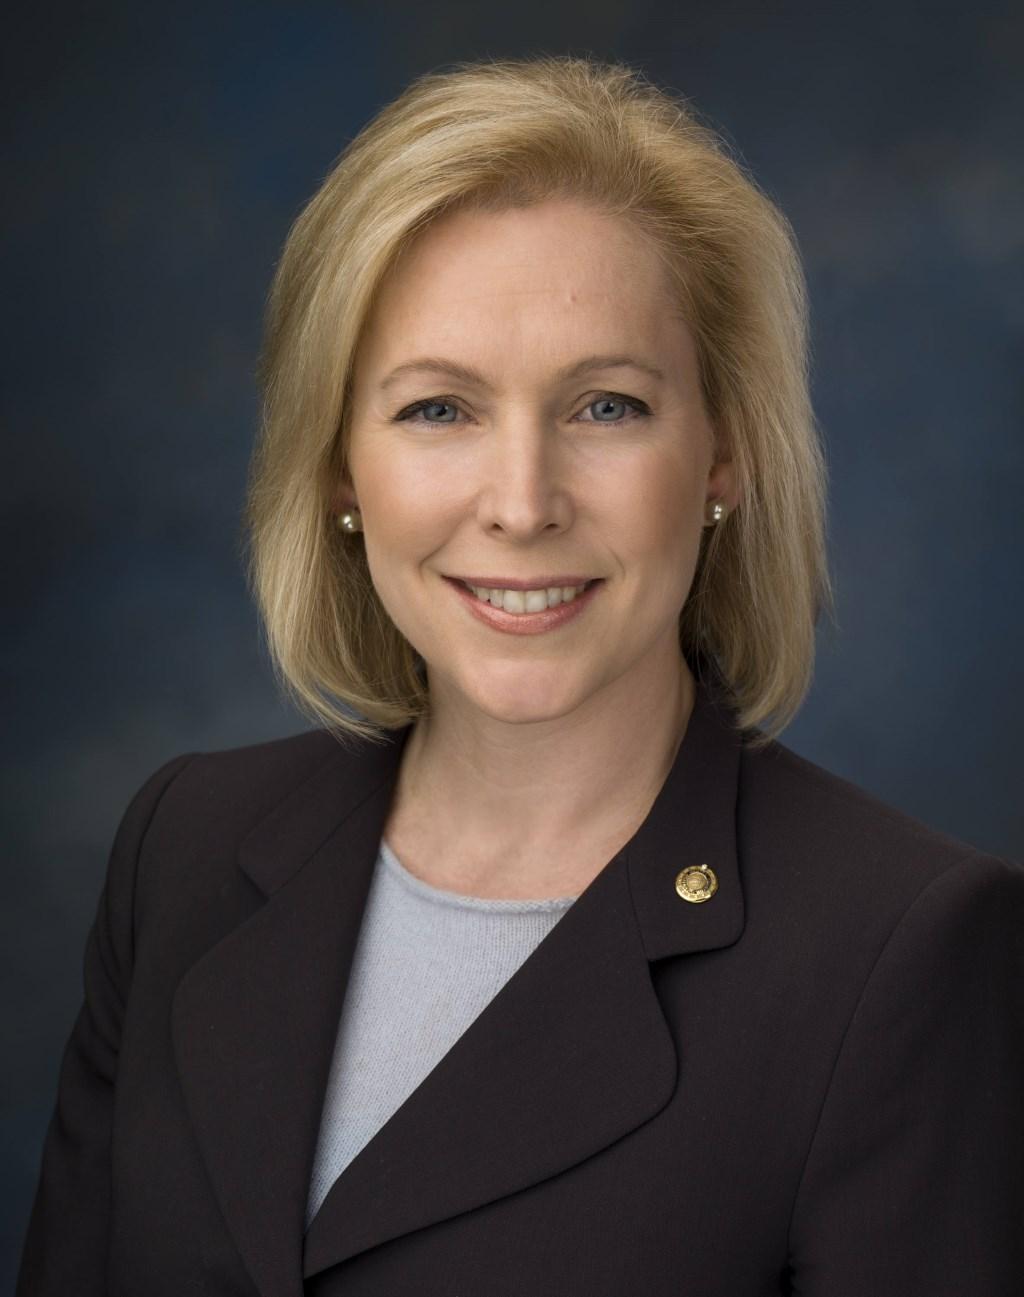 Kirsten Gillibrand. Photo from the U.S. Senate.